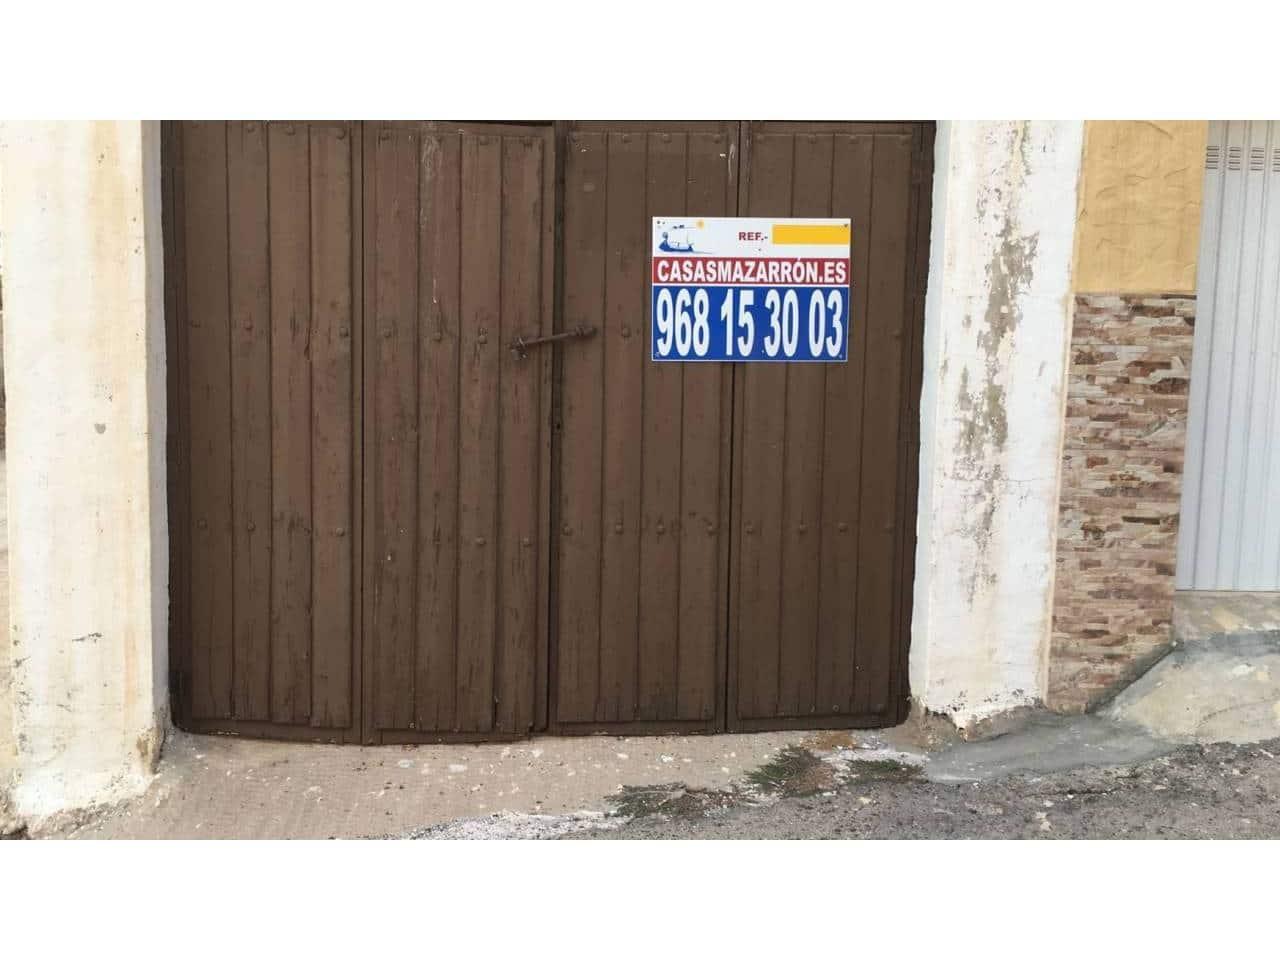 Garage zu verkaufen in La Azohia - 14.500 € (Ref: 4432983)